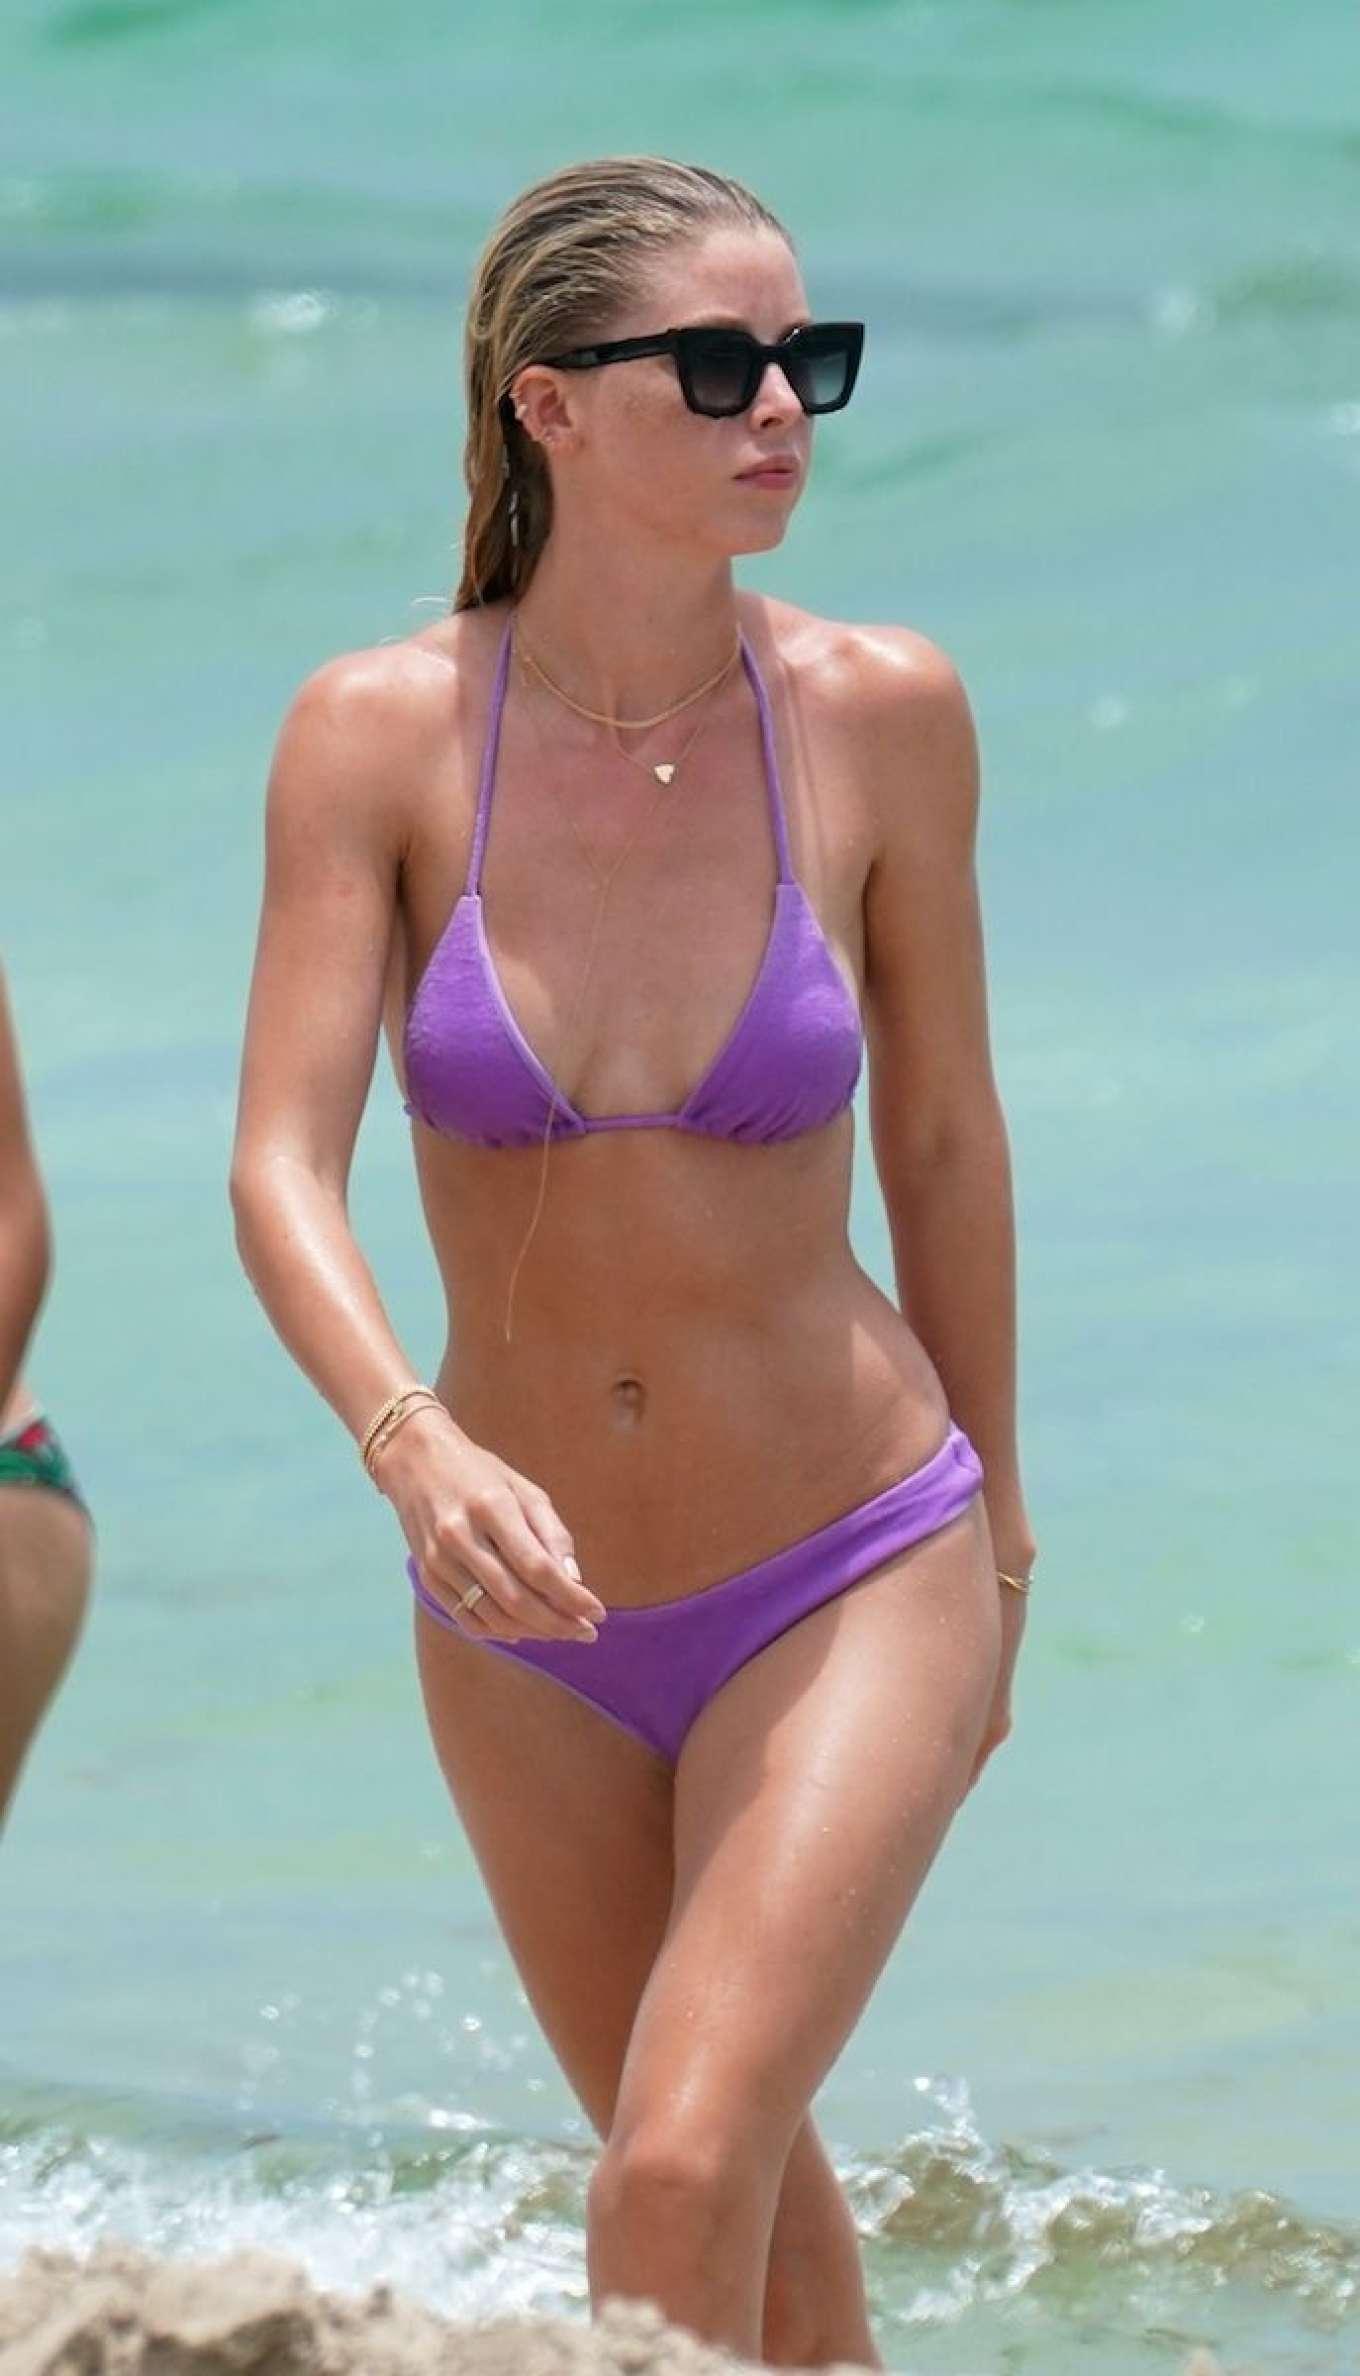 Baskin Champion in Purple Bikini at the beach in Miami